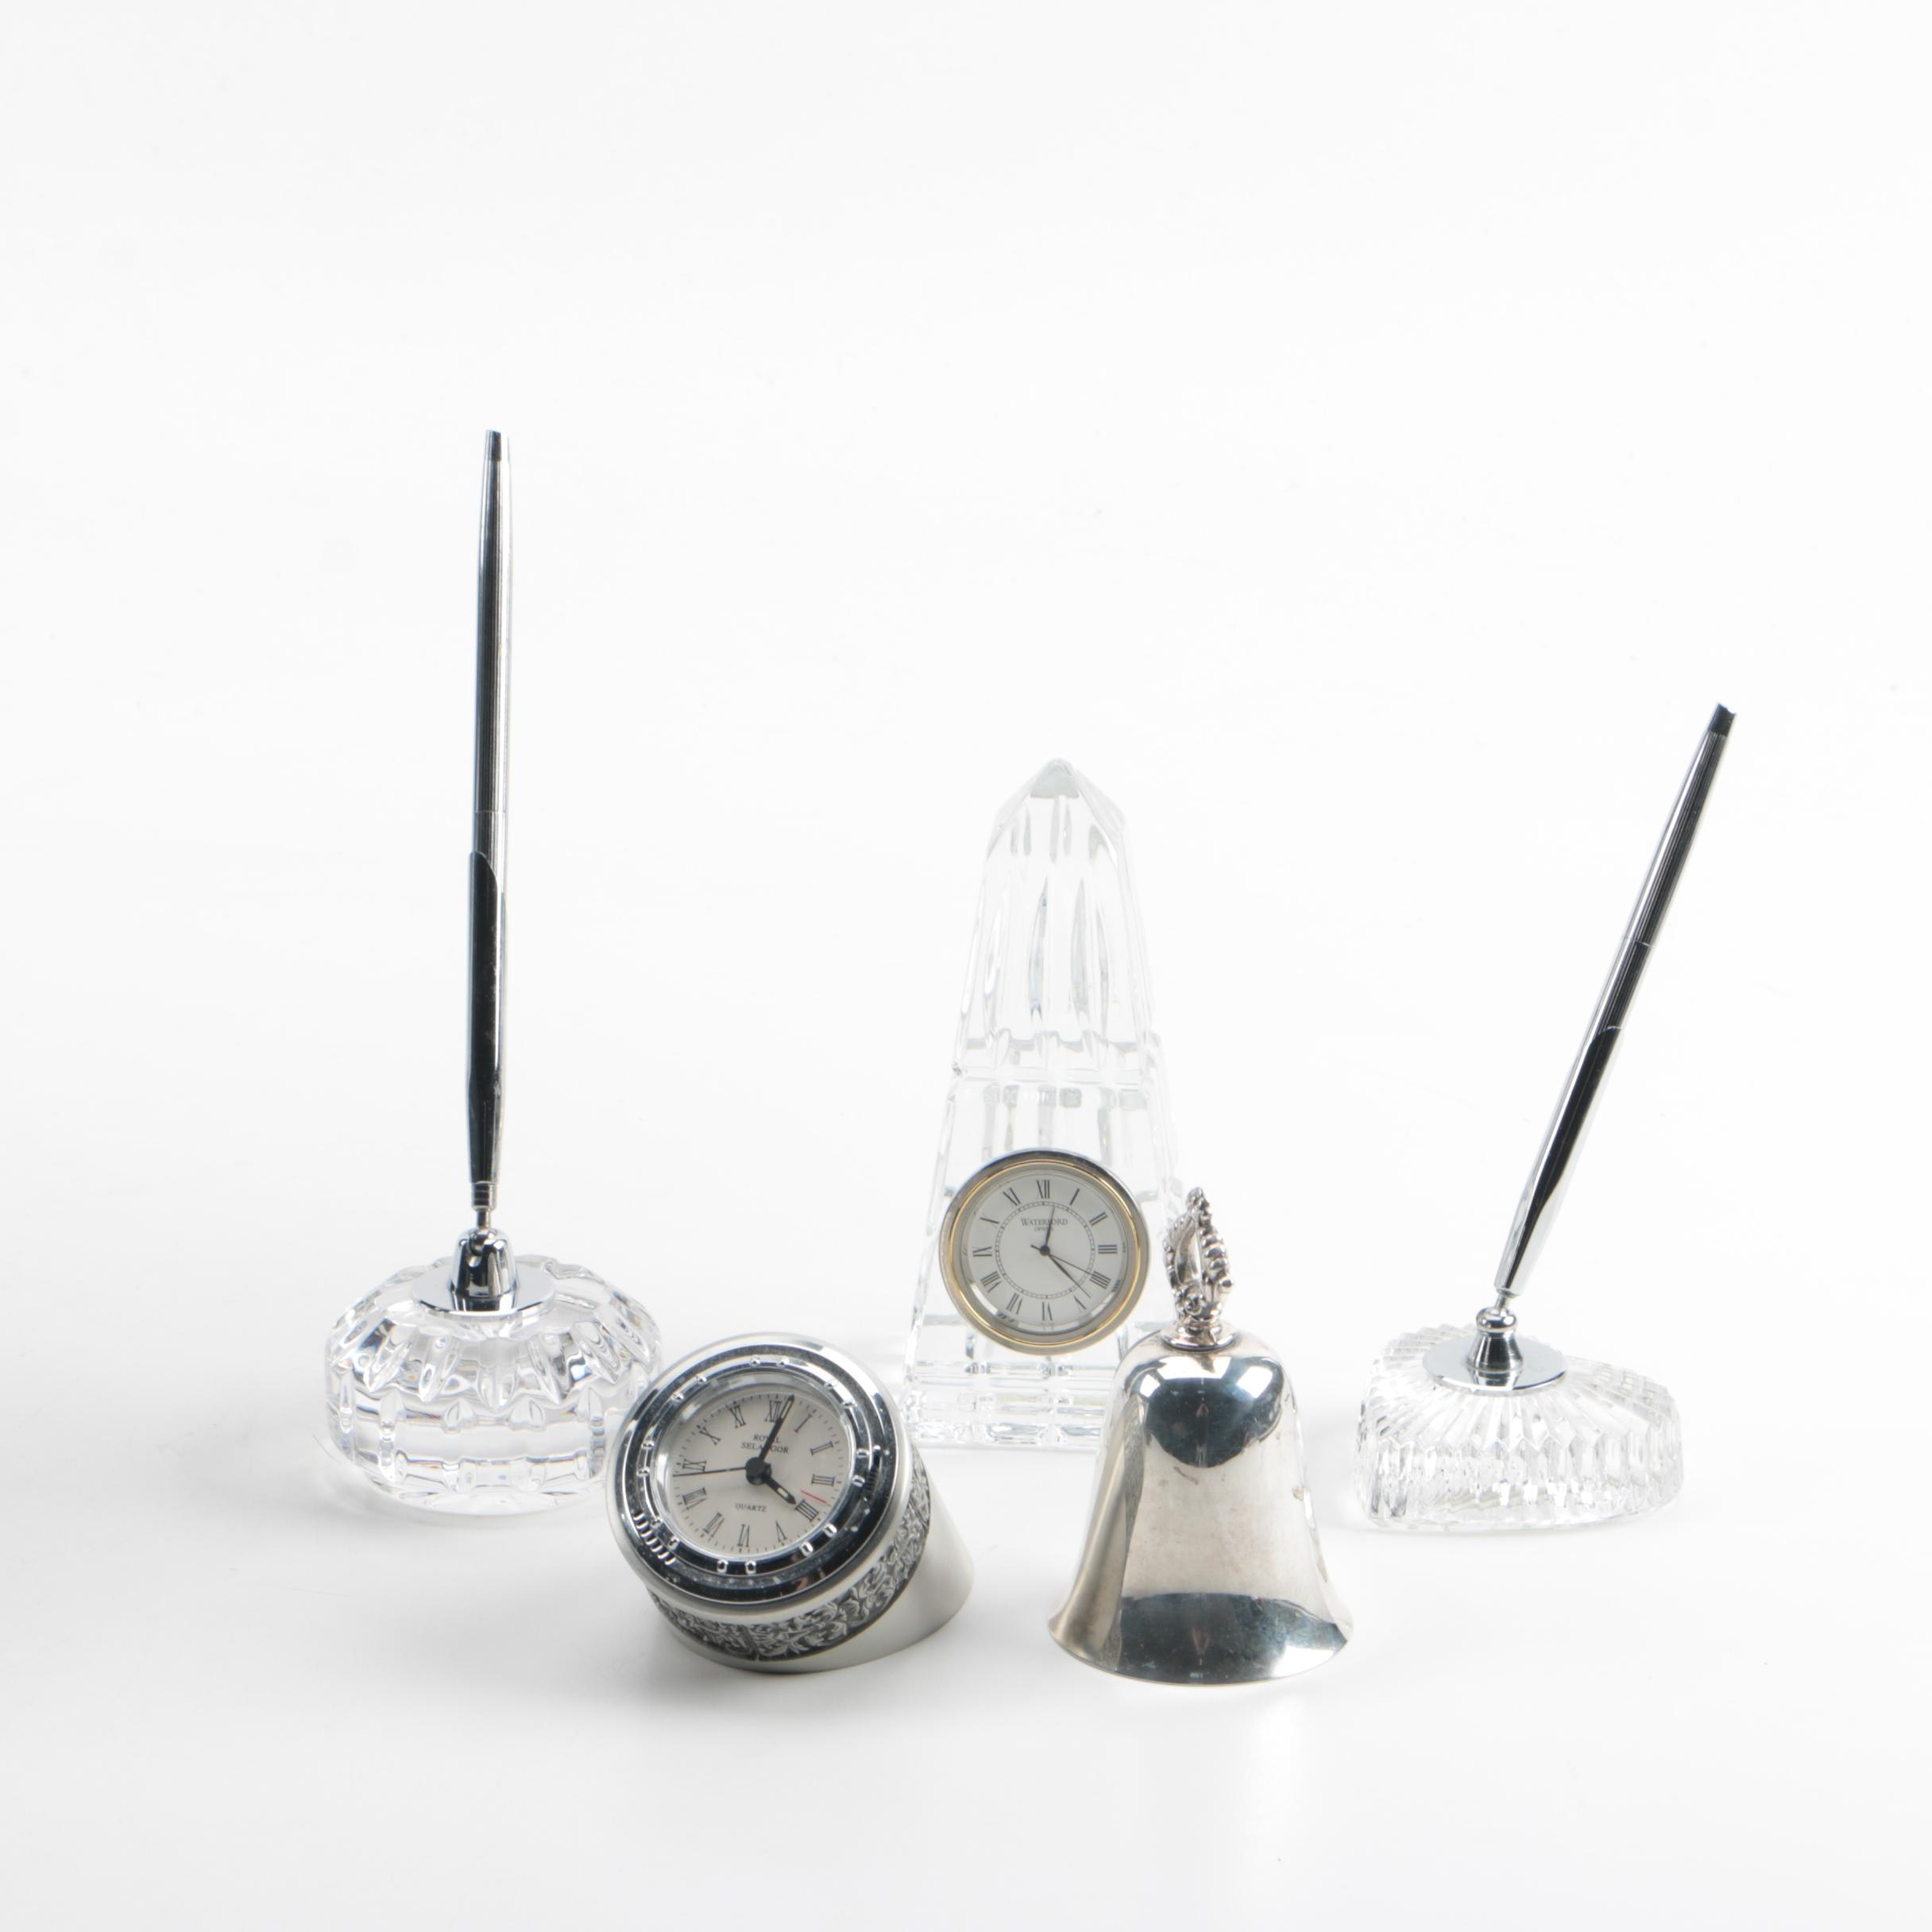 Waterford Crystal Obelisk Clock and Pen Holders with Pewter Royal Selangor Clock